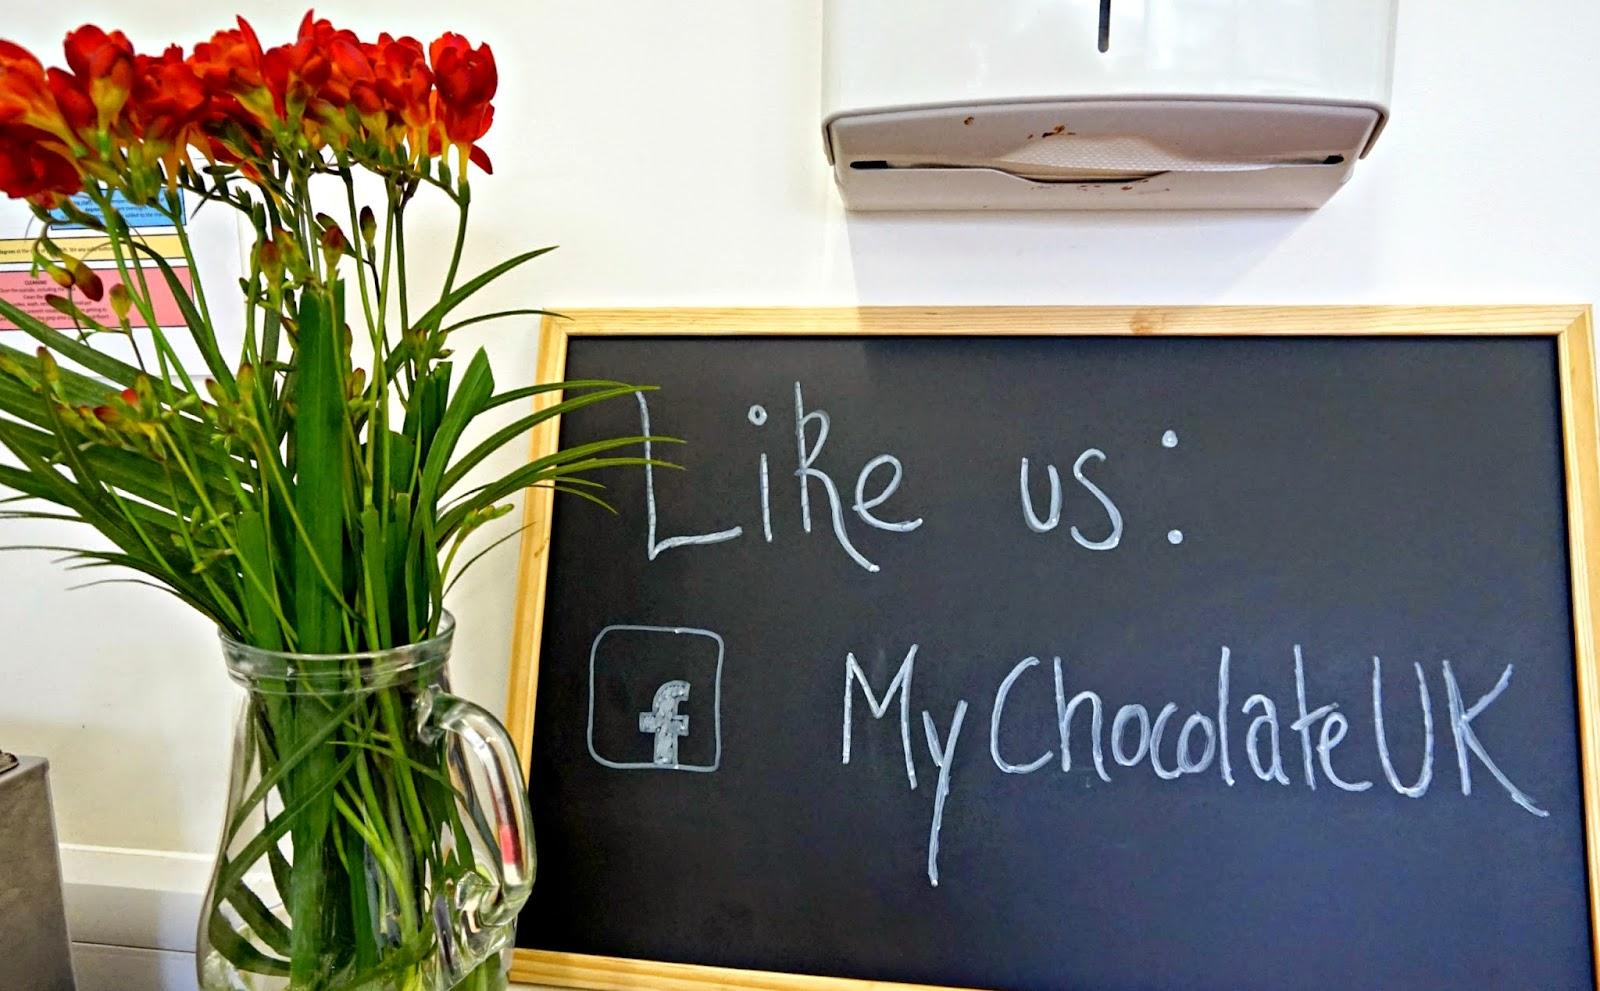 MyChocolateUK chocolate workshop, London